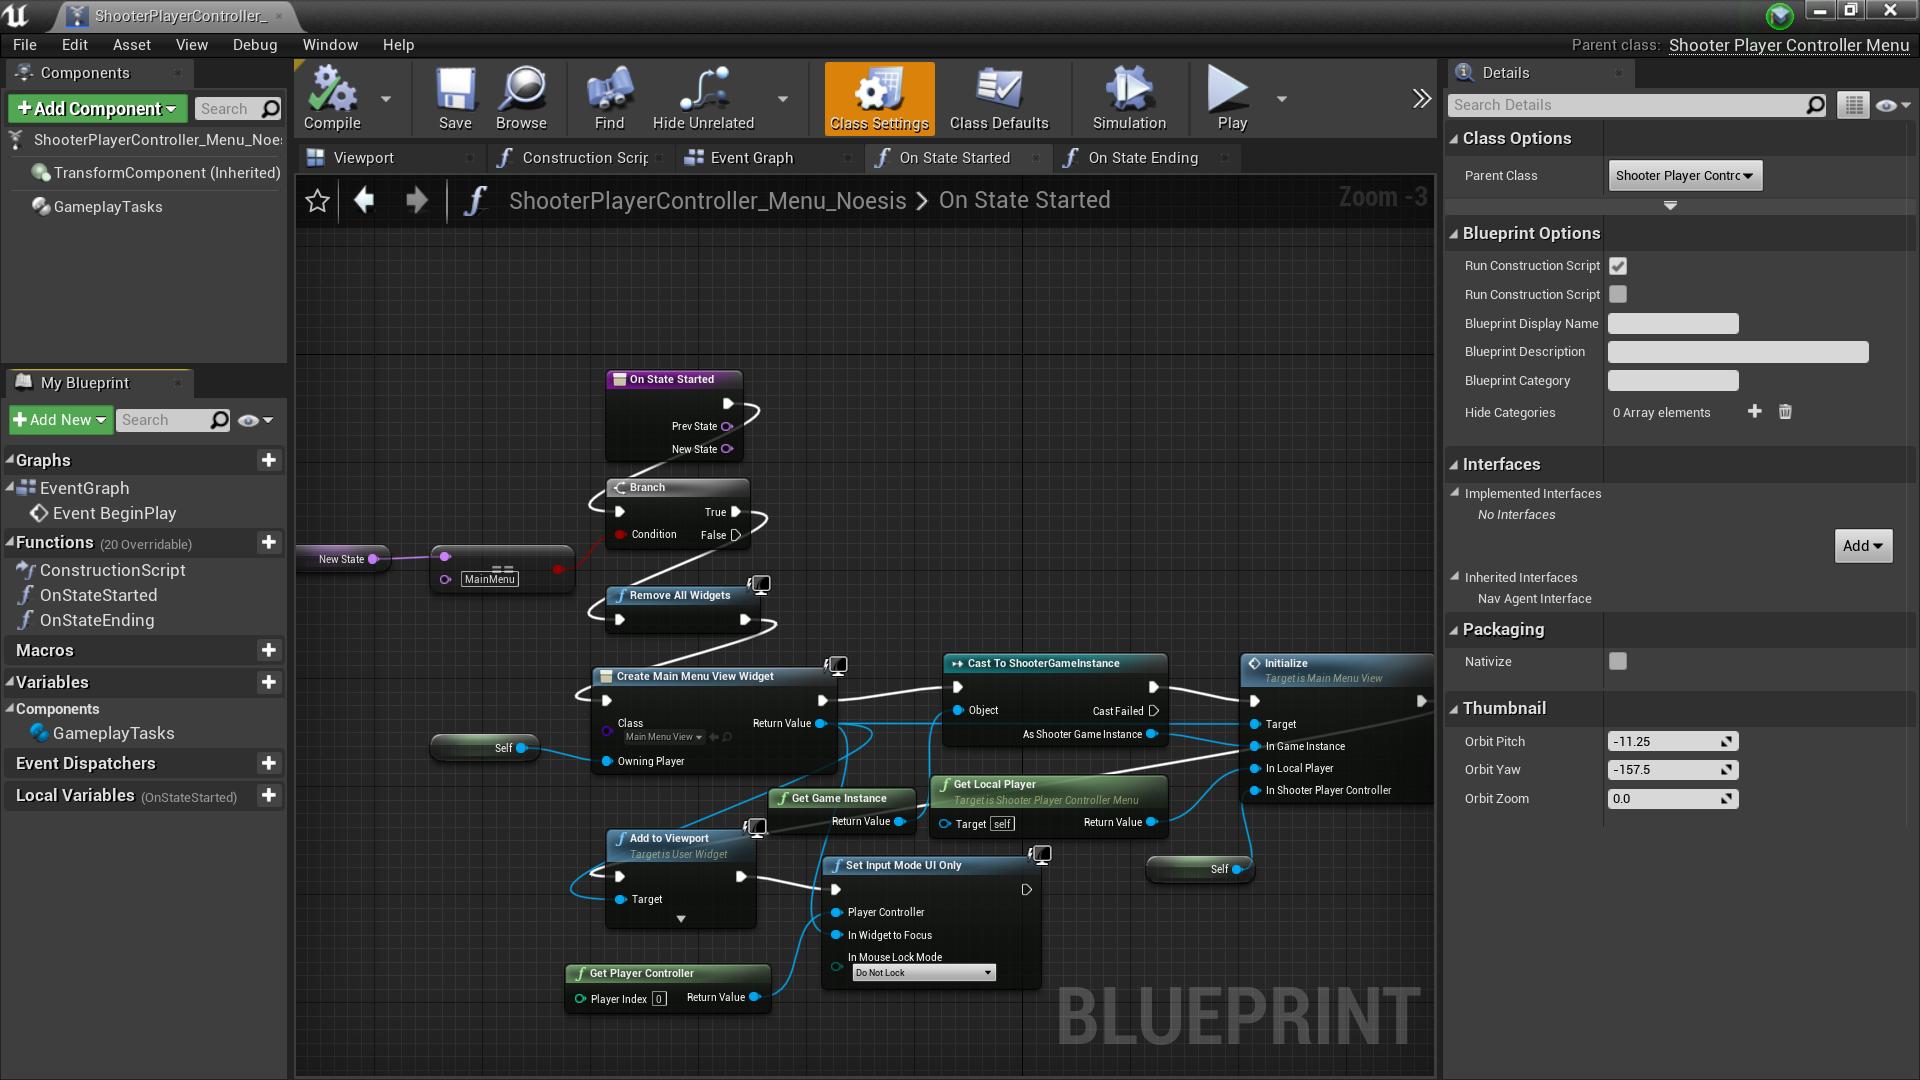 Blueprint'/Game/ShooterGame/ShooterPlayerController_Menu_Noesis.ShooterPlayerController_Menu_Noesis'